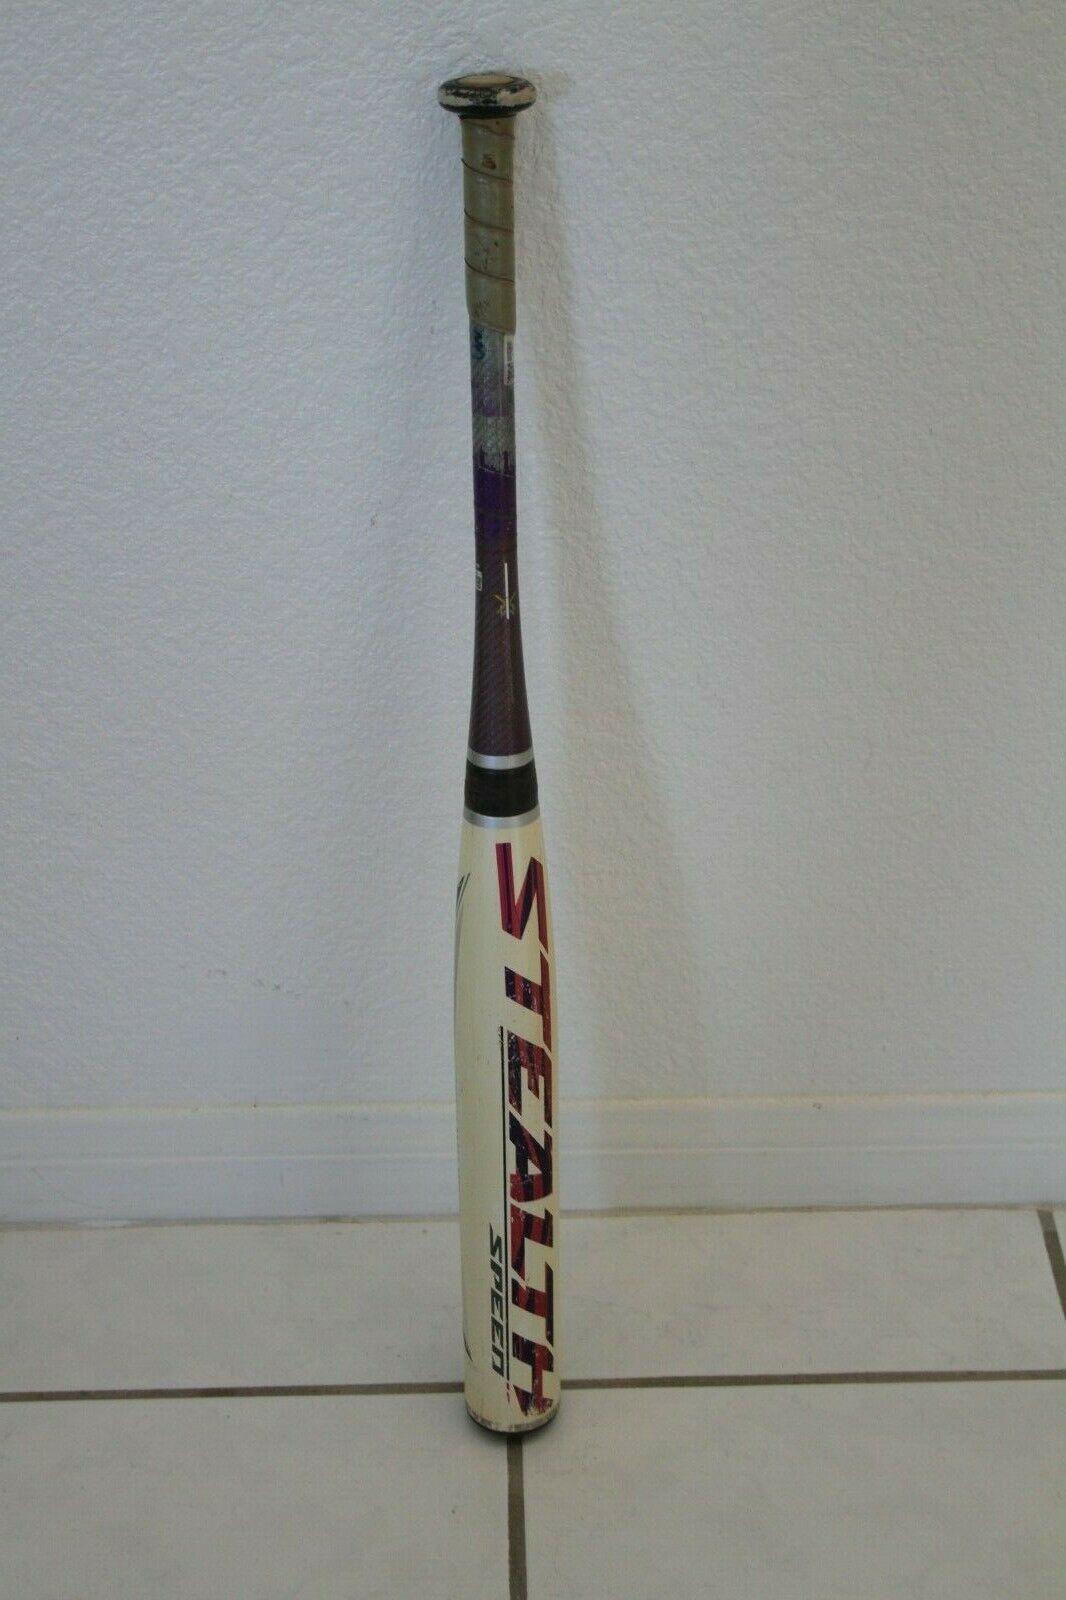 Easton Stealth velocidad SSR3B 30 20 Fastpitch Softball bate compuesto (-10)